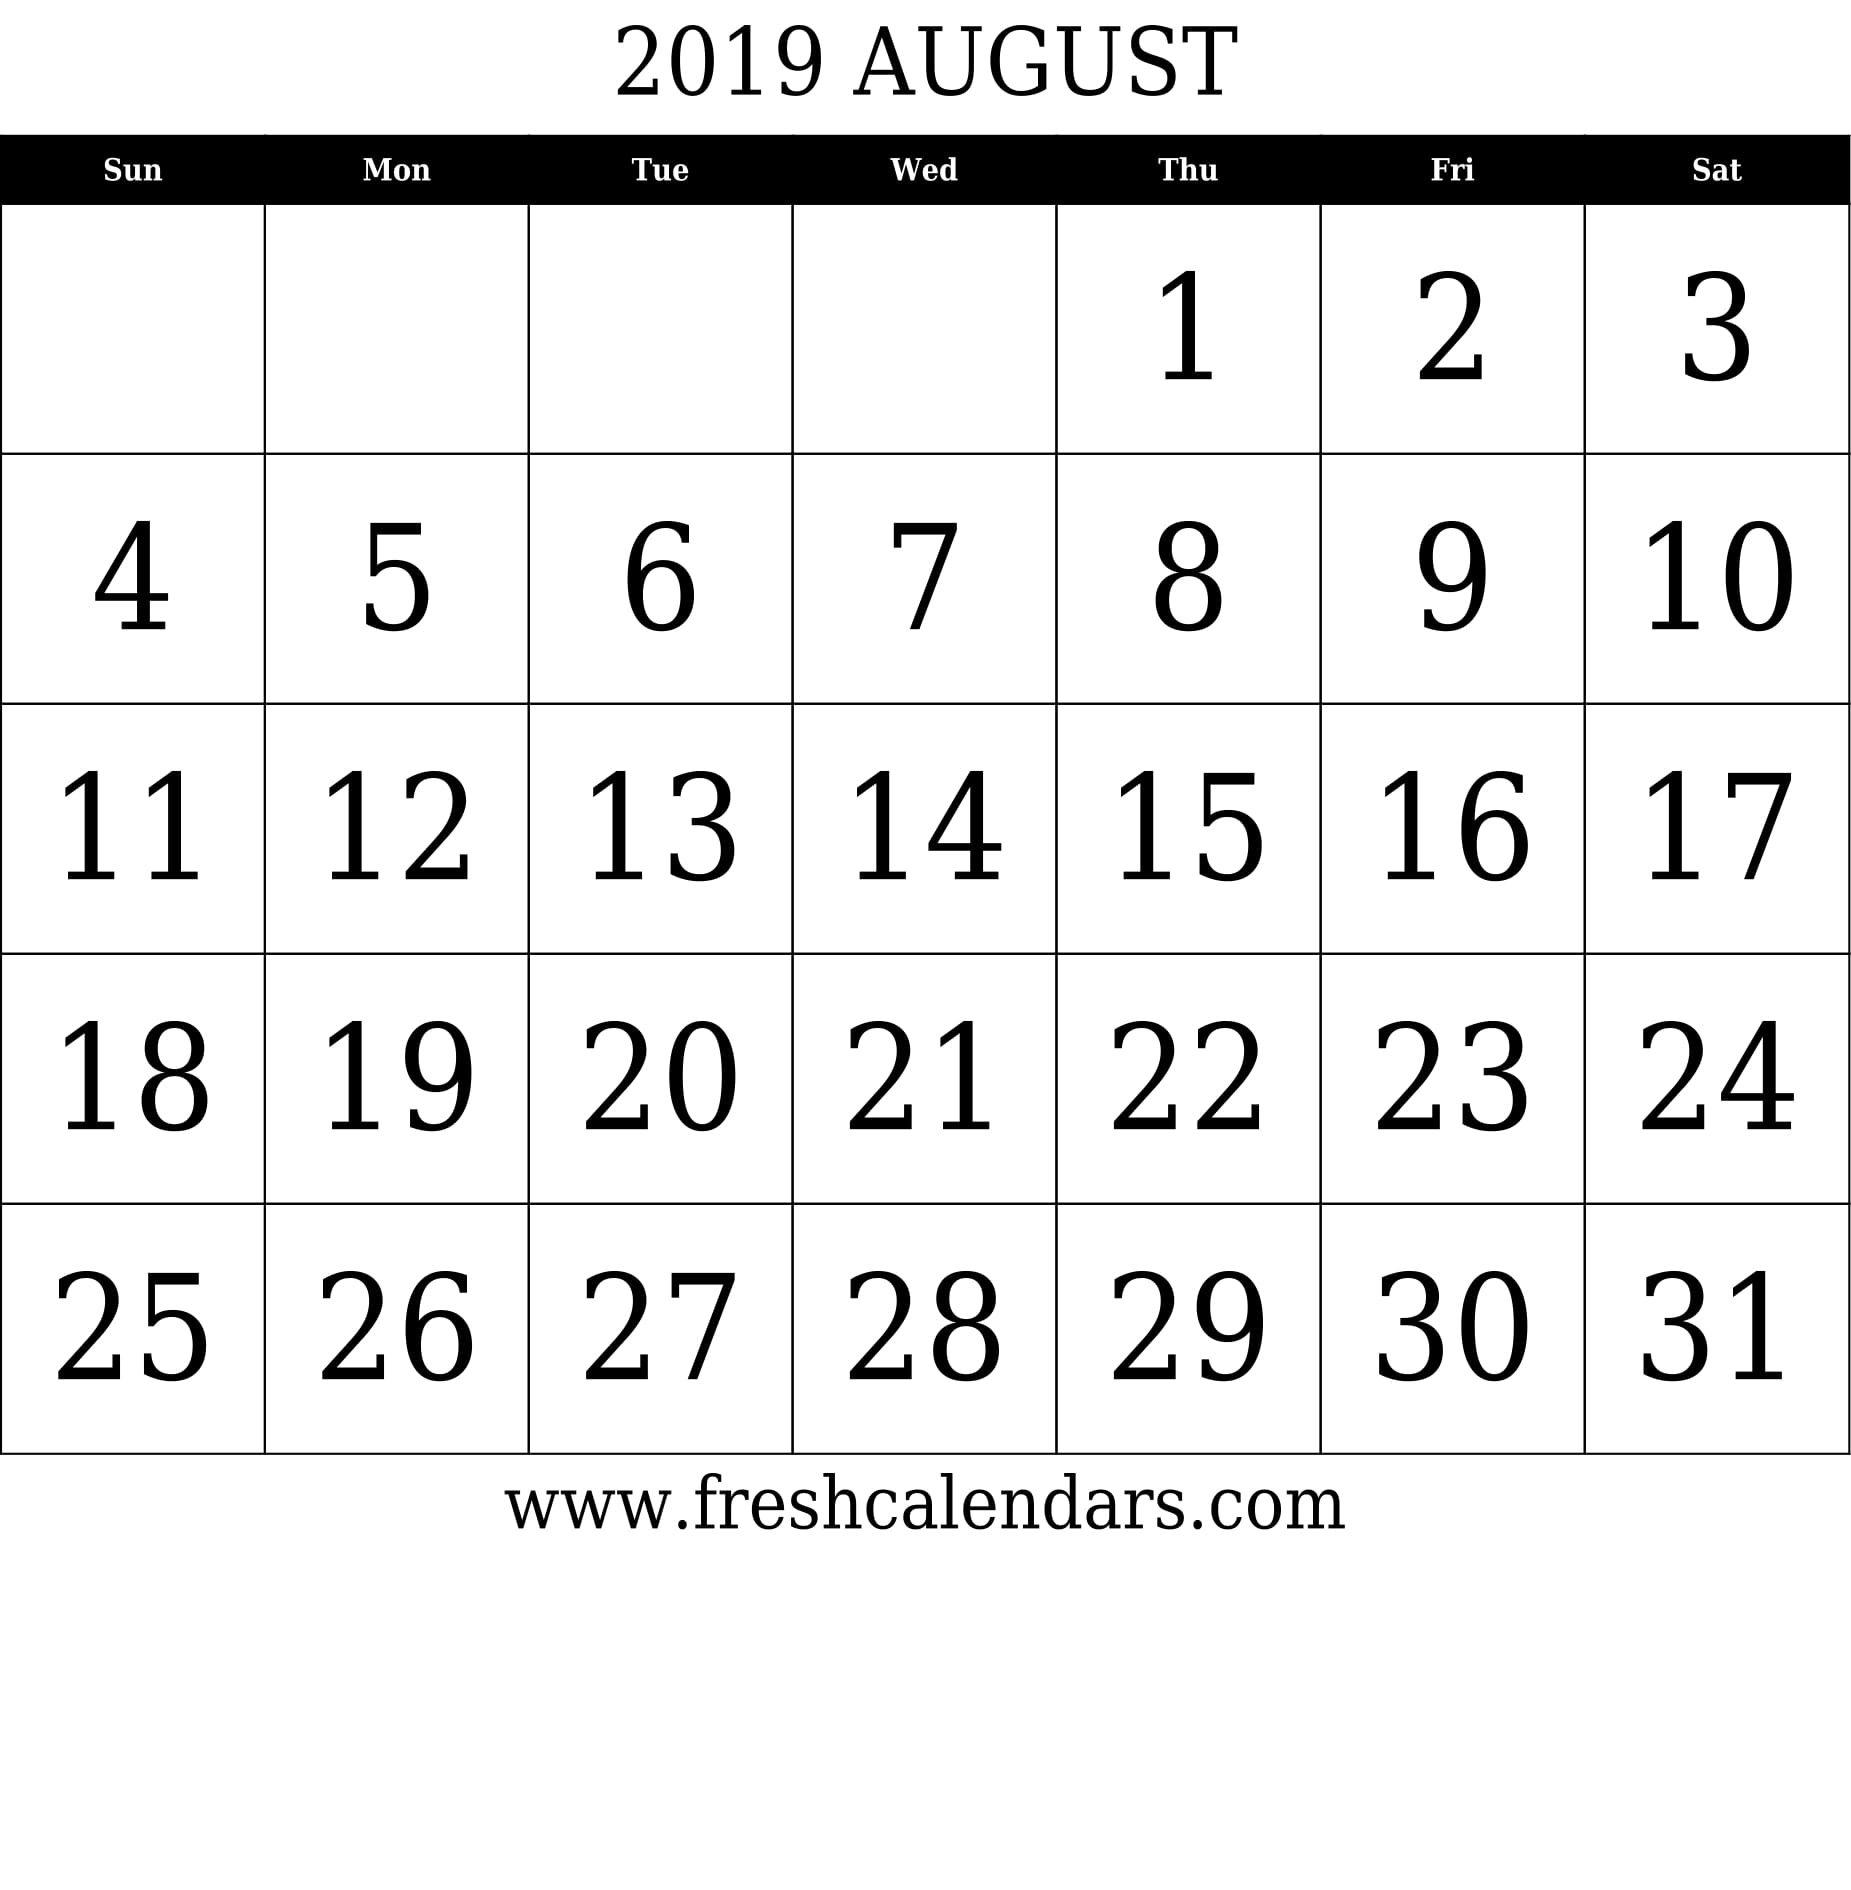 August 2019 Calendar Printable – Fresh Calendars August 7 2019 Calendar